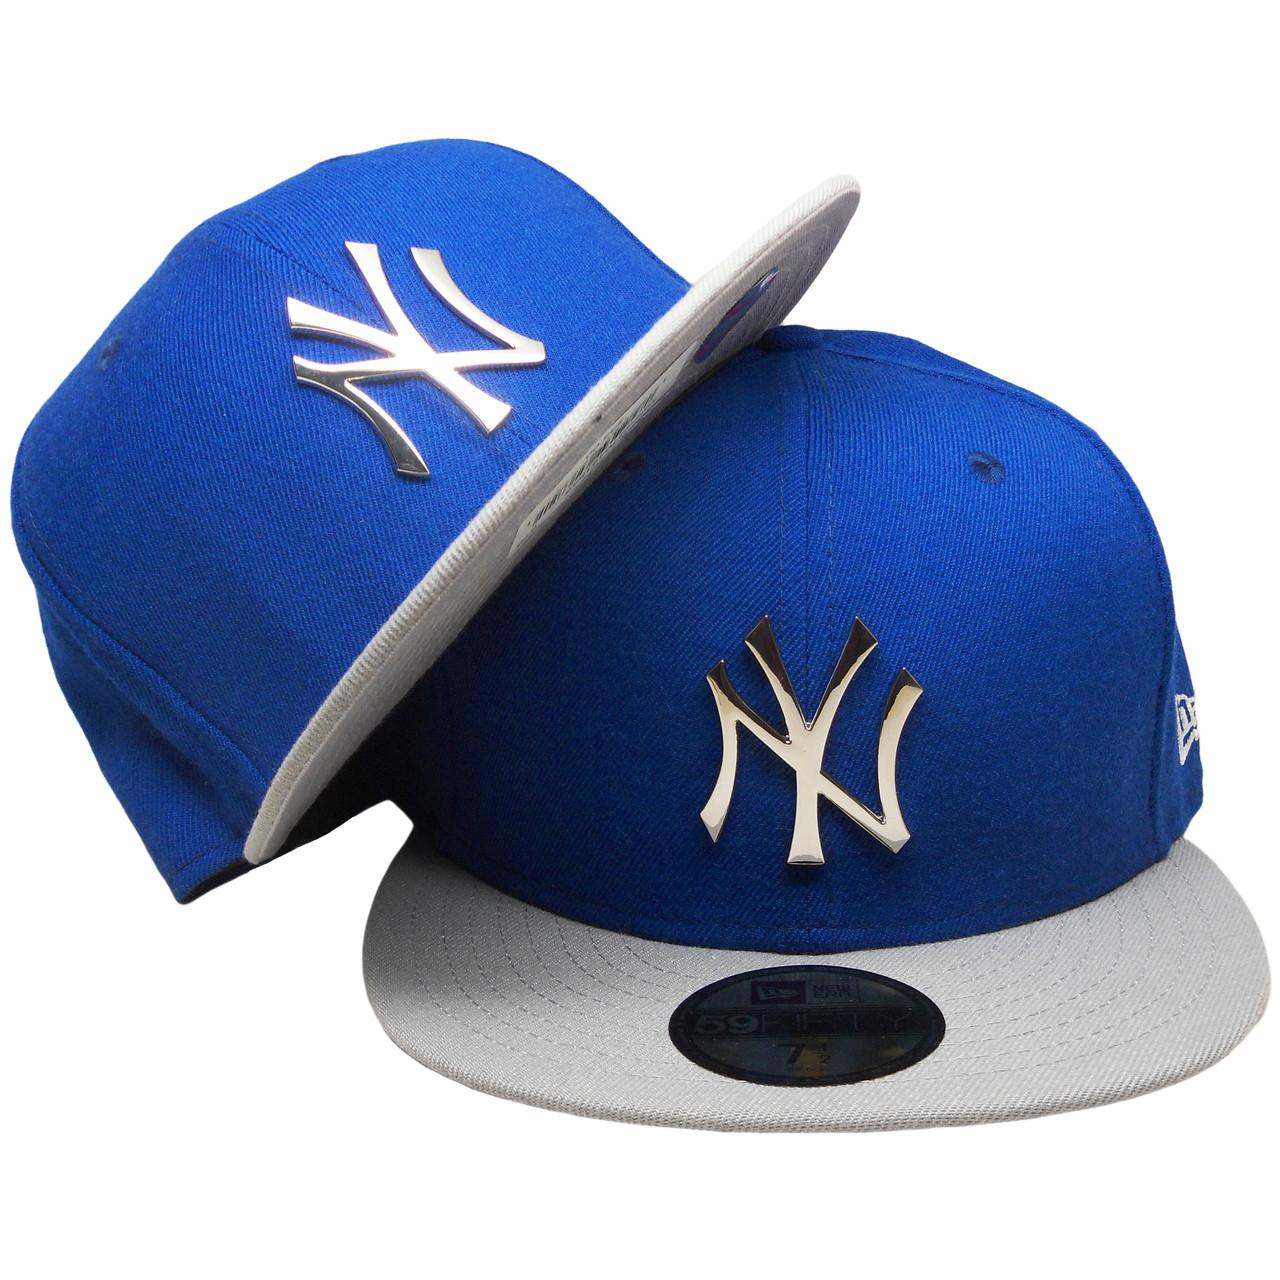 17b1048a New York Yankees New Era Custom Metallic Badge 59Fifty Fitted - Royal,  Gray, Silver